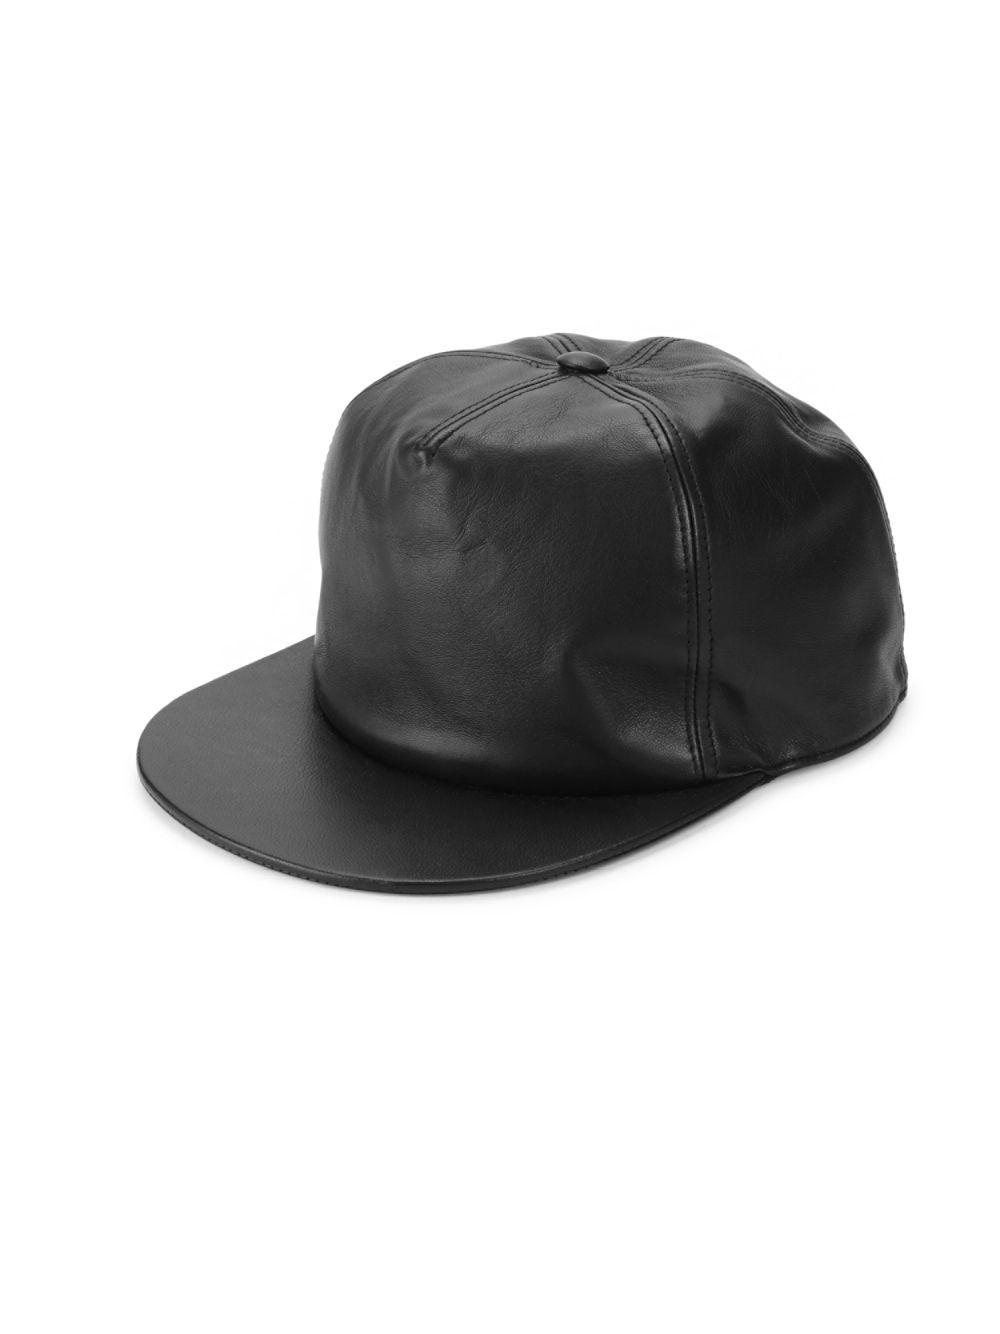 ec9b5c951d2 Lyst - Givenchy Leather Baseball Cap in Black for Men